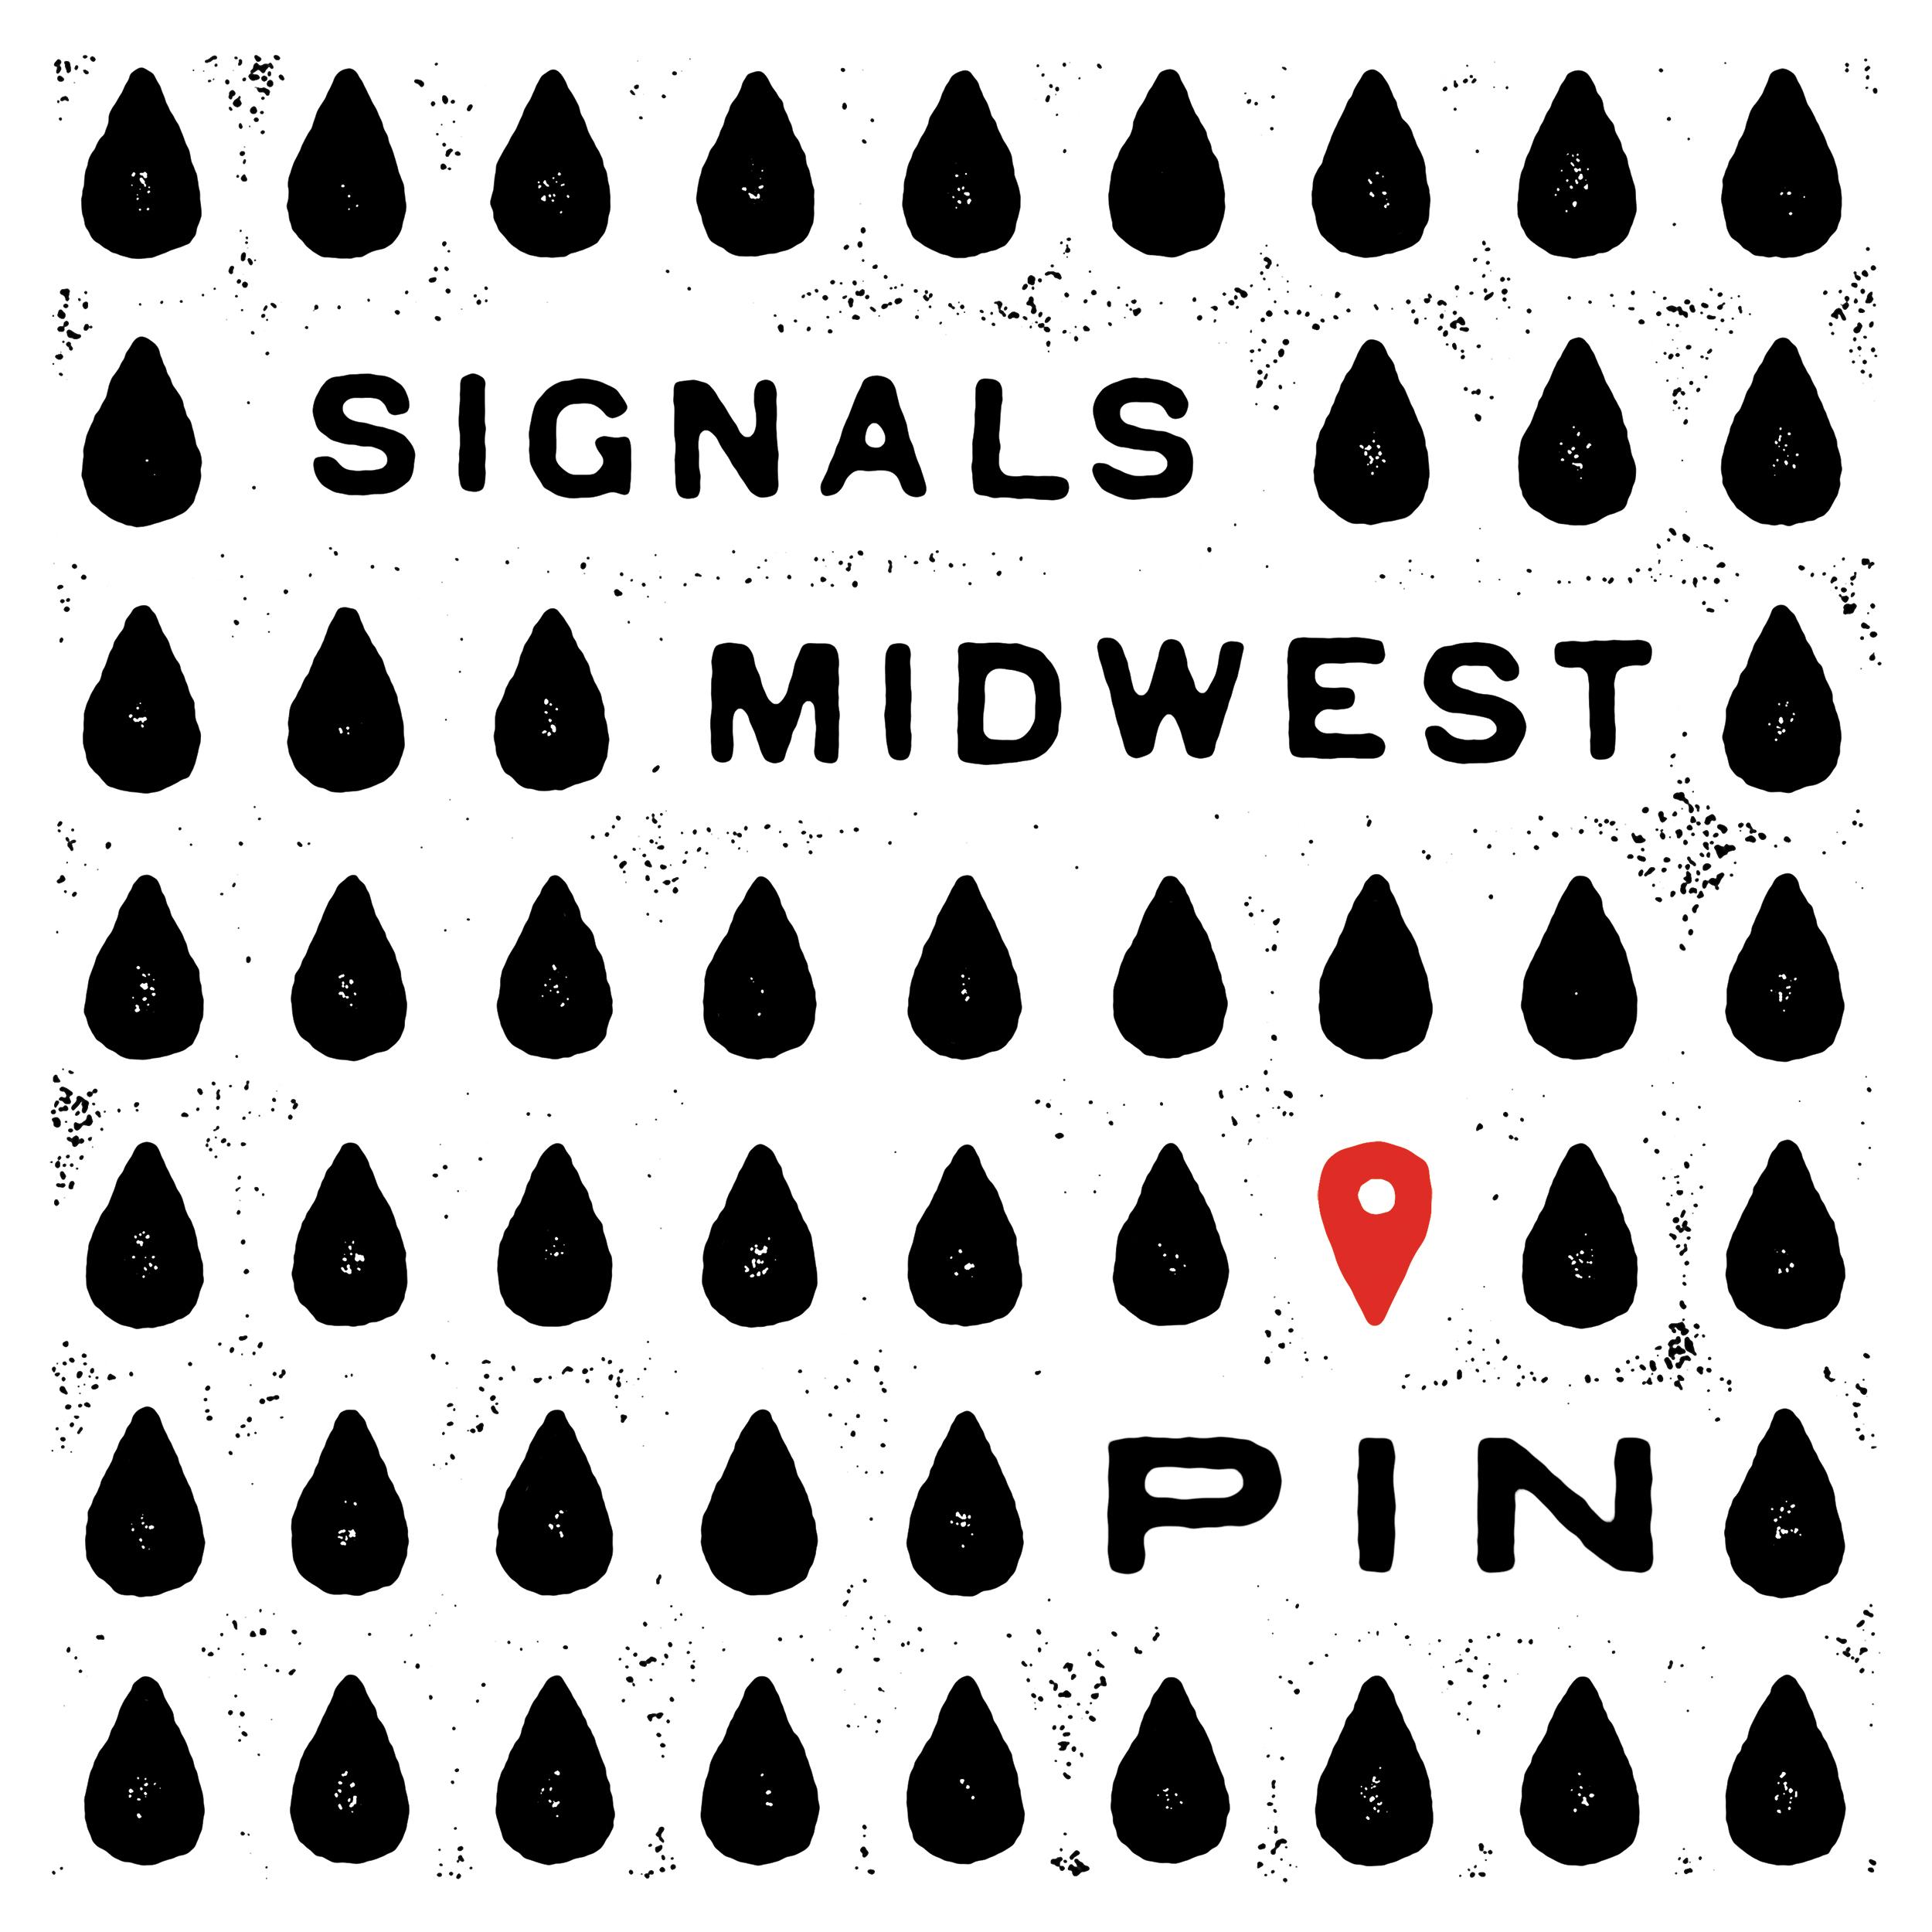 signals midwest.jpg